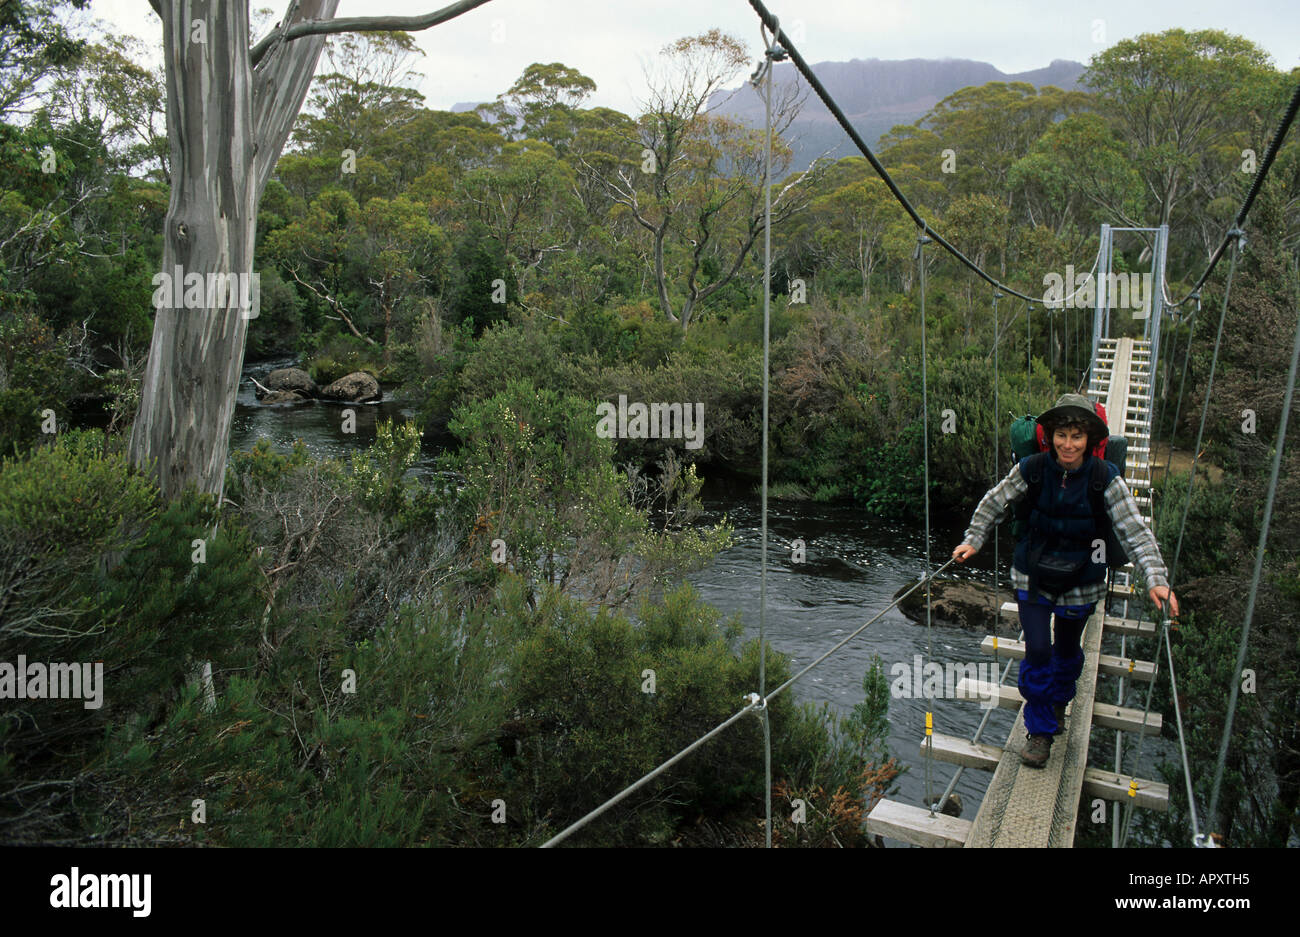 Bridge crossing, Cradle Mountain National Park, Australia, Tasmania, woman crossing Narcissus River on swing bridge, Overland Tr - Stock Image